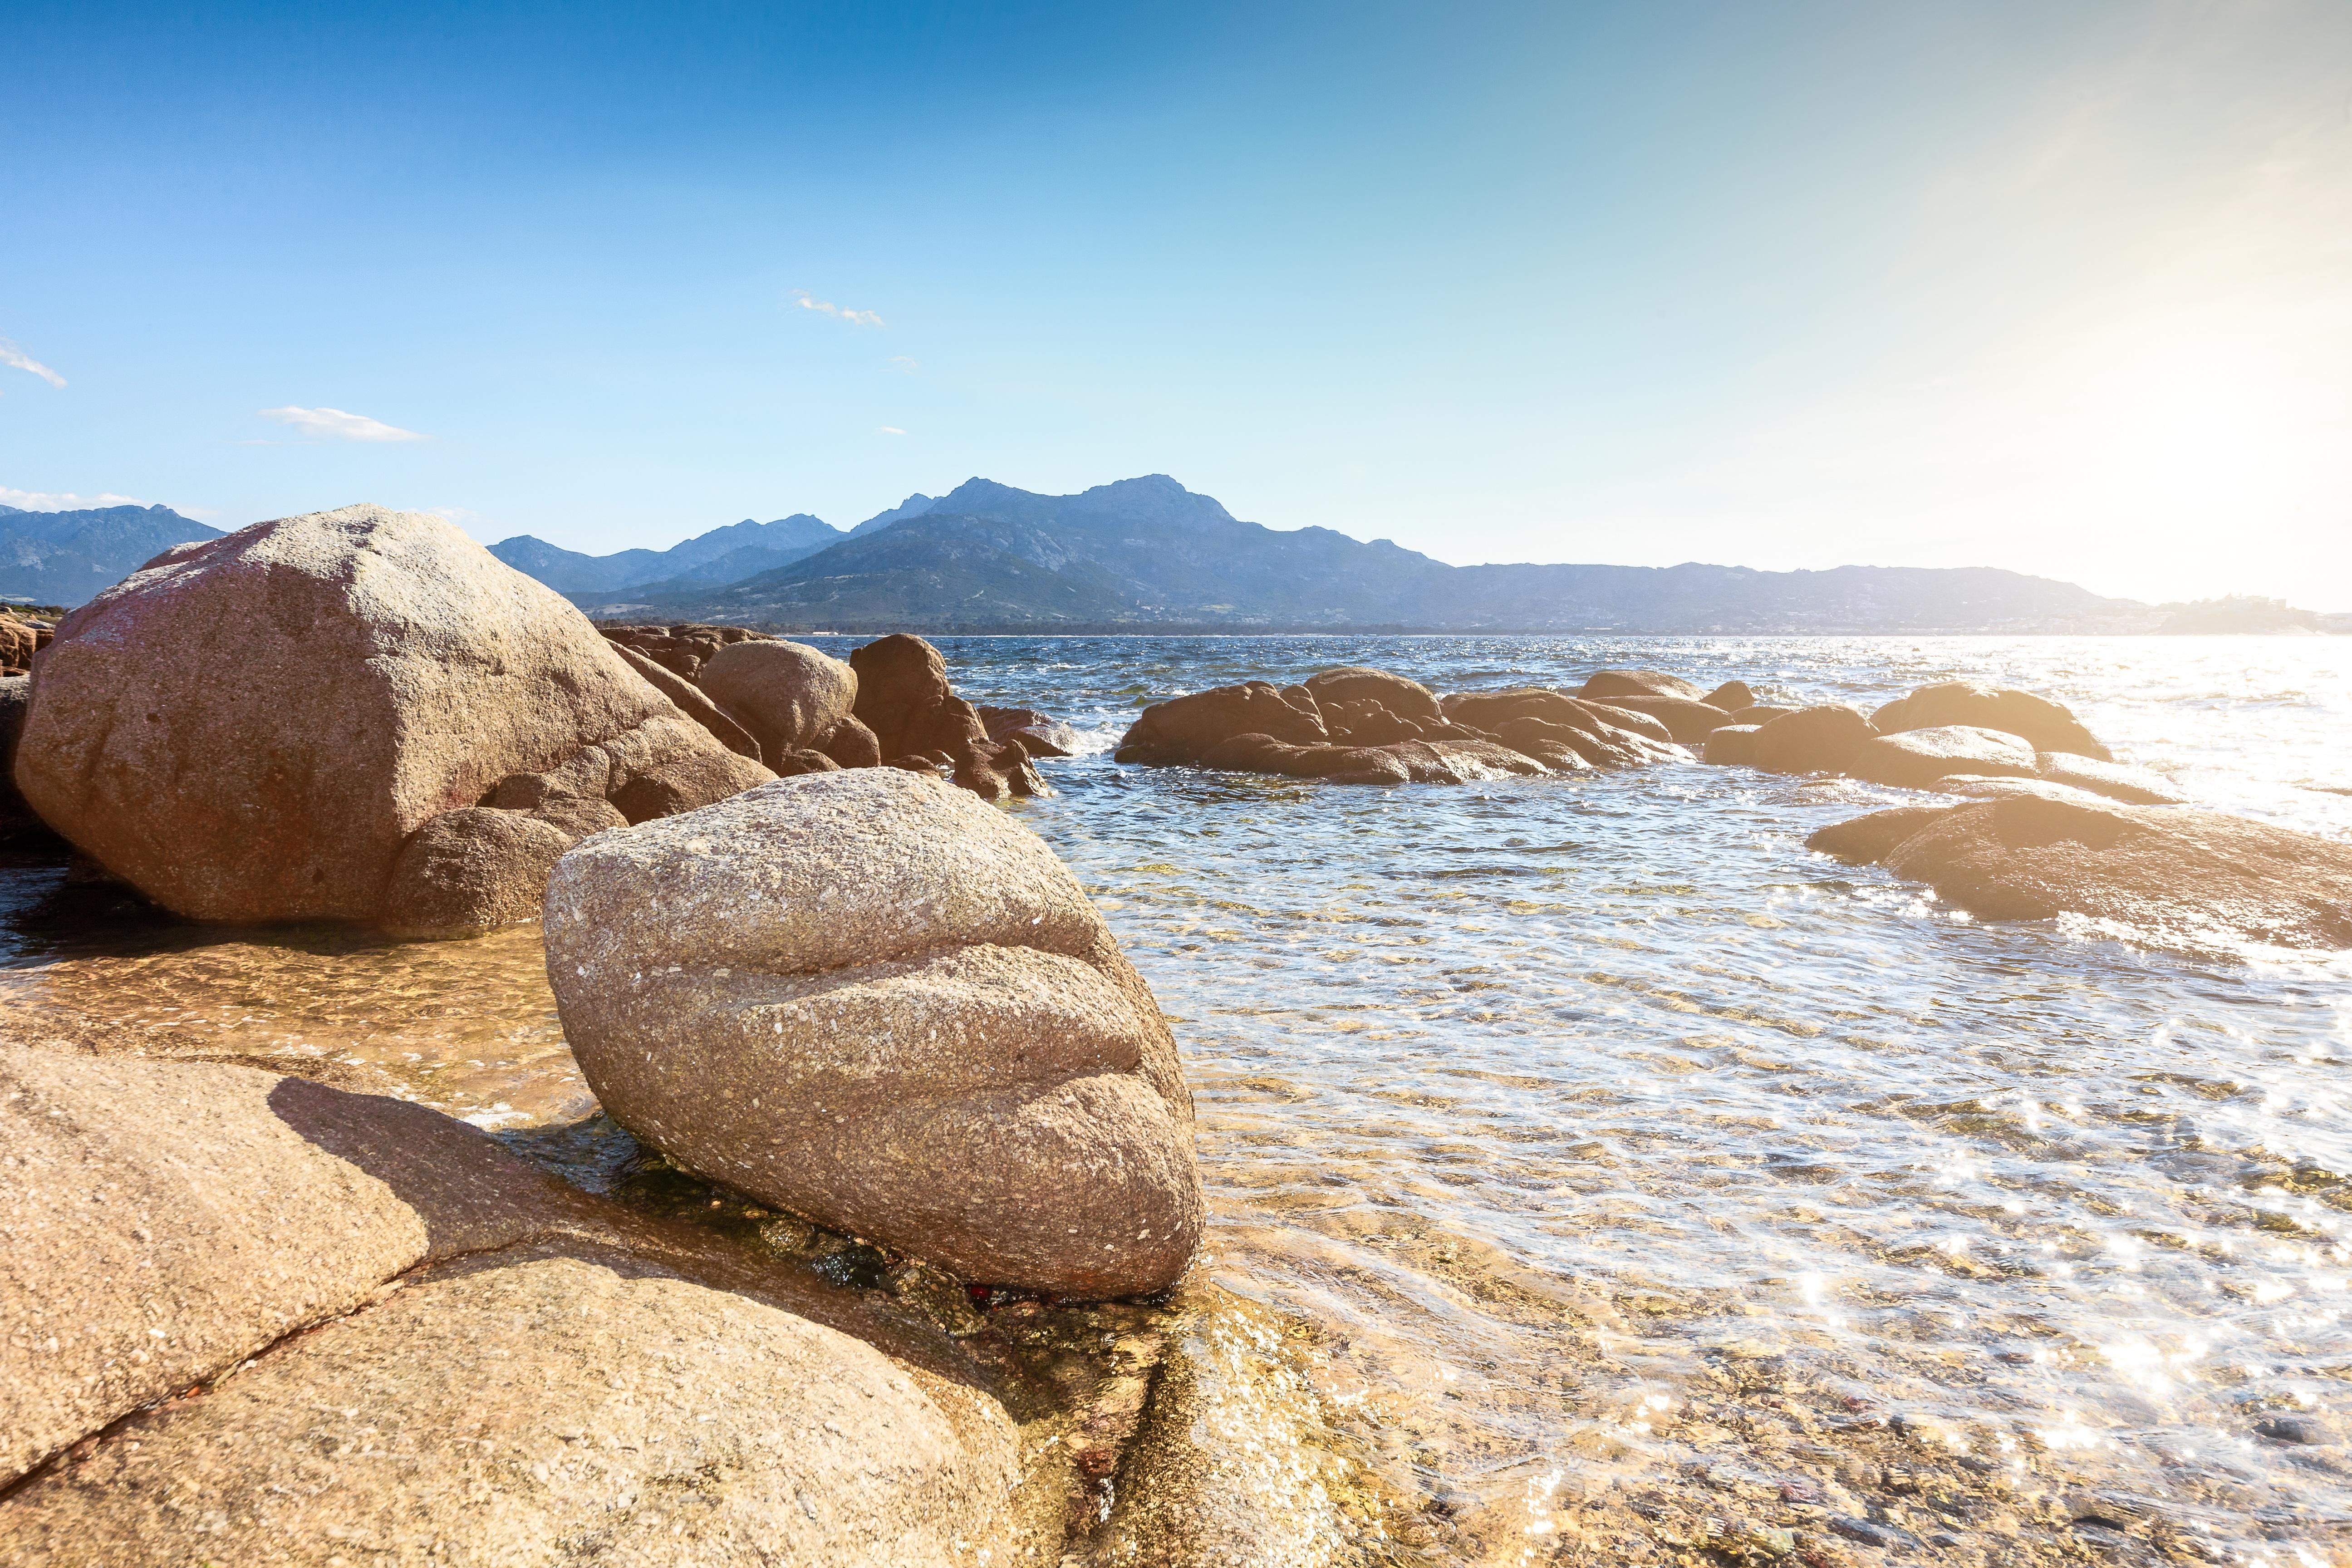 Картинка камешки у моря